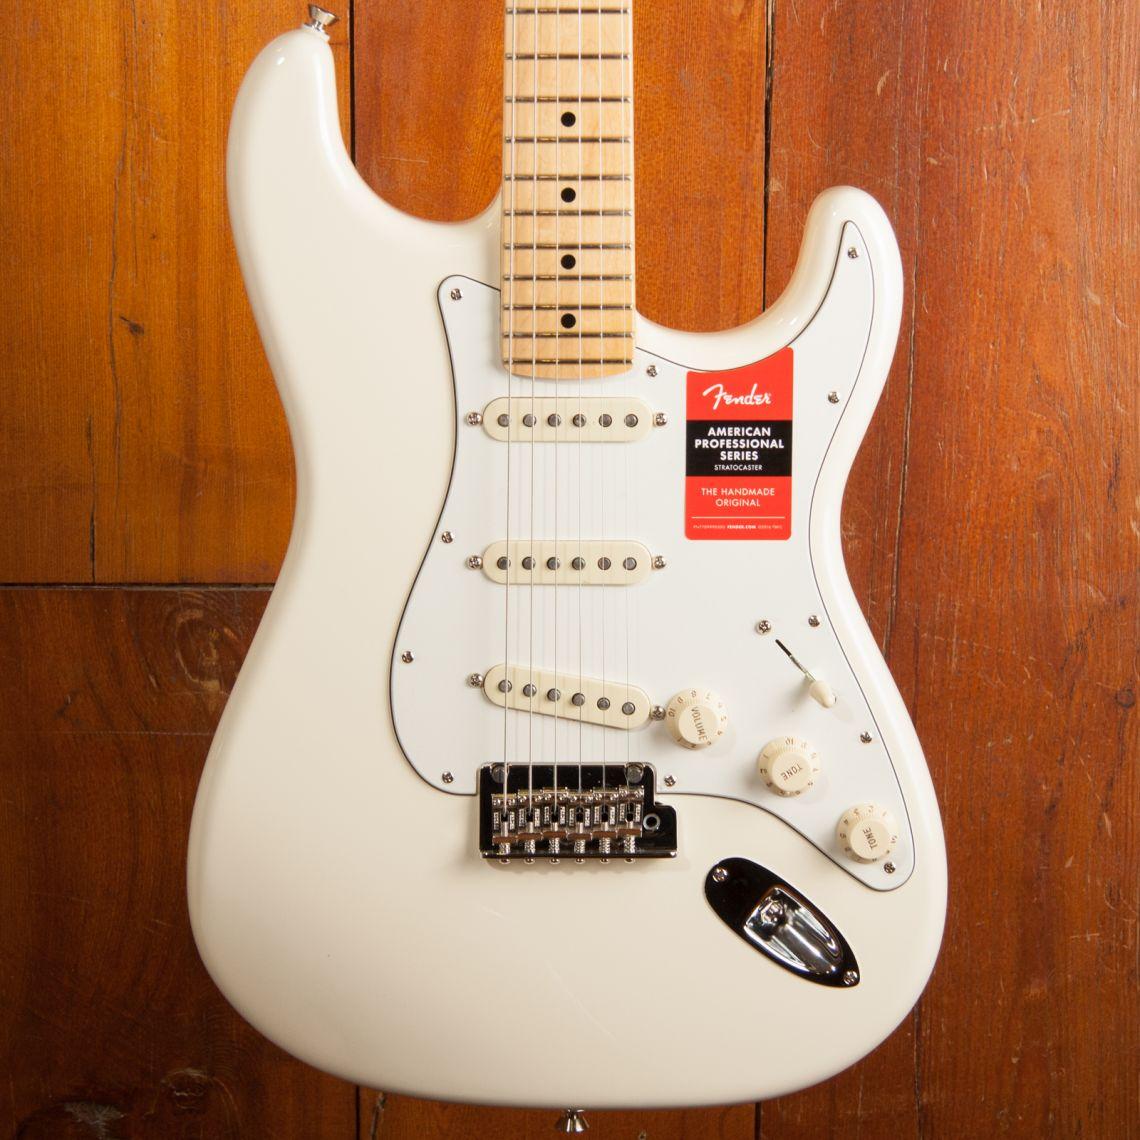 USA Fender Stratocaster Strat GUITAR KNOBS Volume Tone White American Special